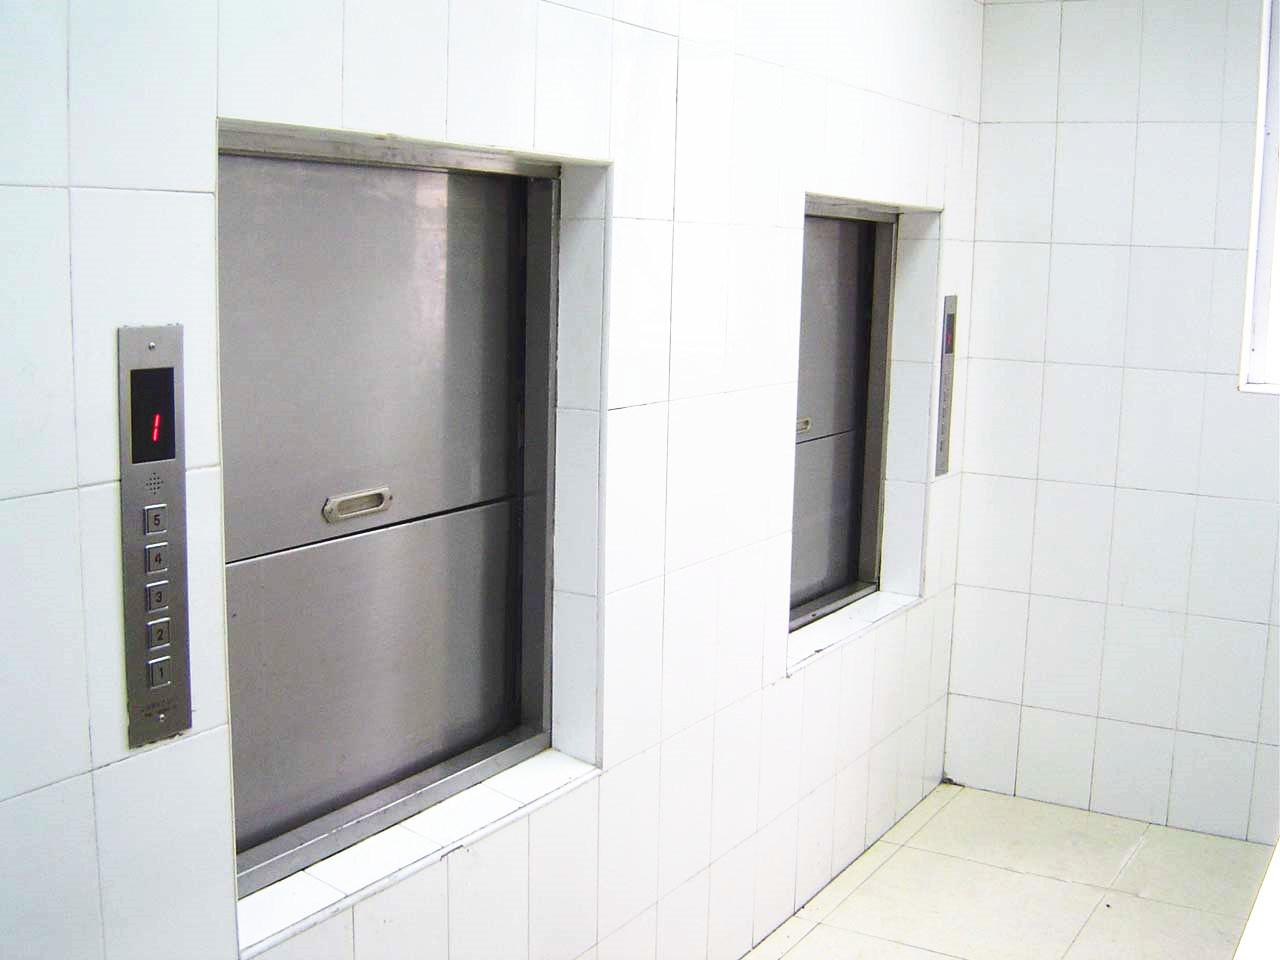 China Dumbwaiter Elevator Service Lift with Window Type - China Dumbwaiter  Elevator, Dumbwaiter Lift